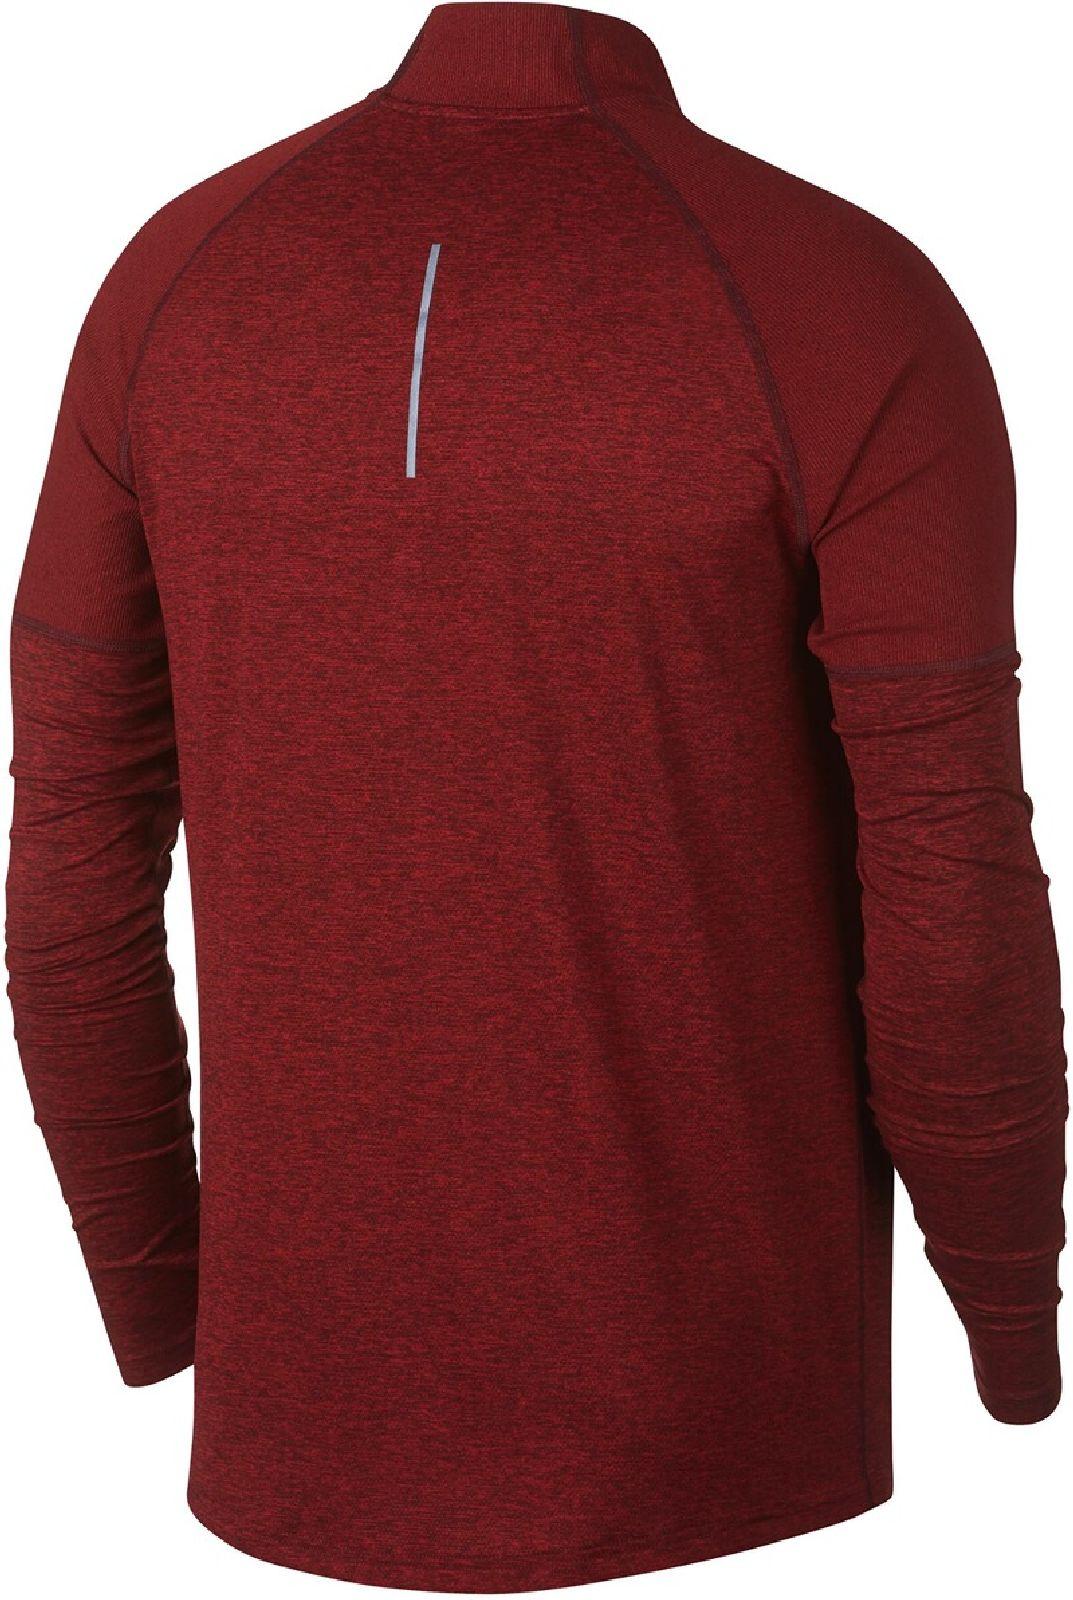 M Gr Preiswert Kaufen Funktionsshirt Rot StraßEnpreis Kurzarm Oregon